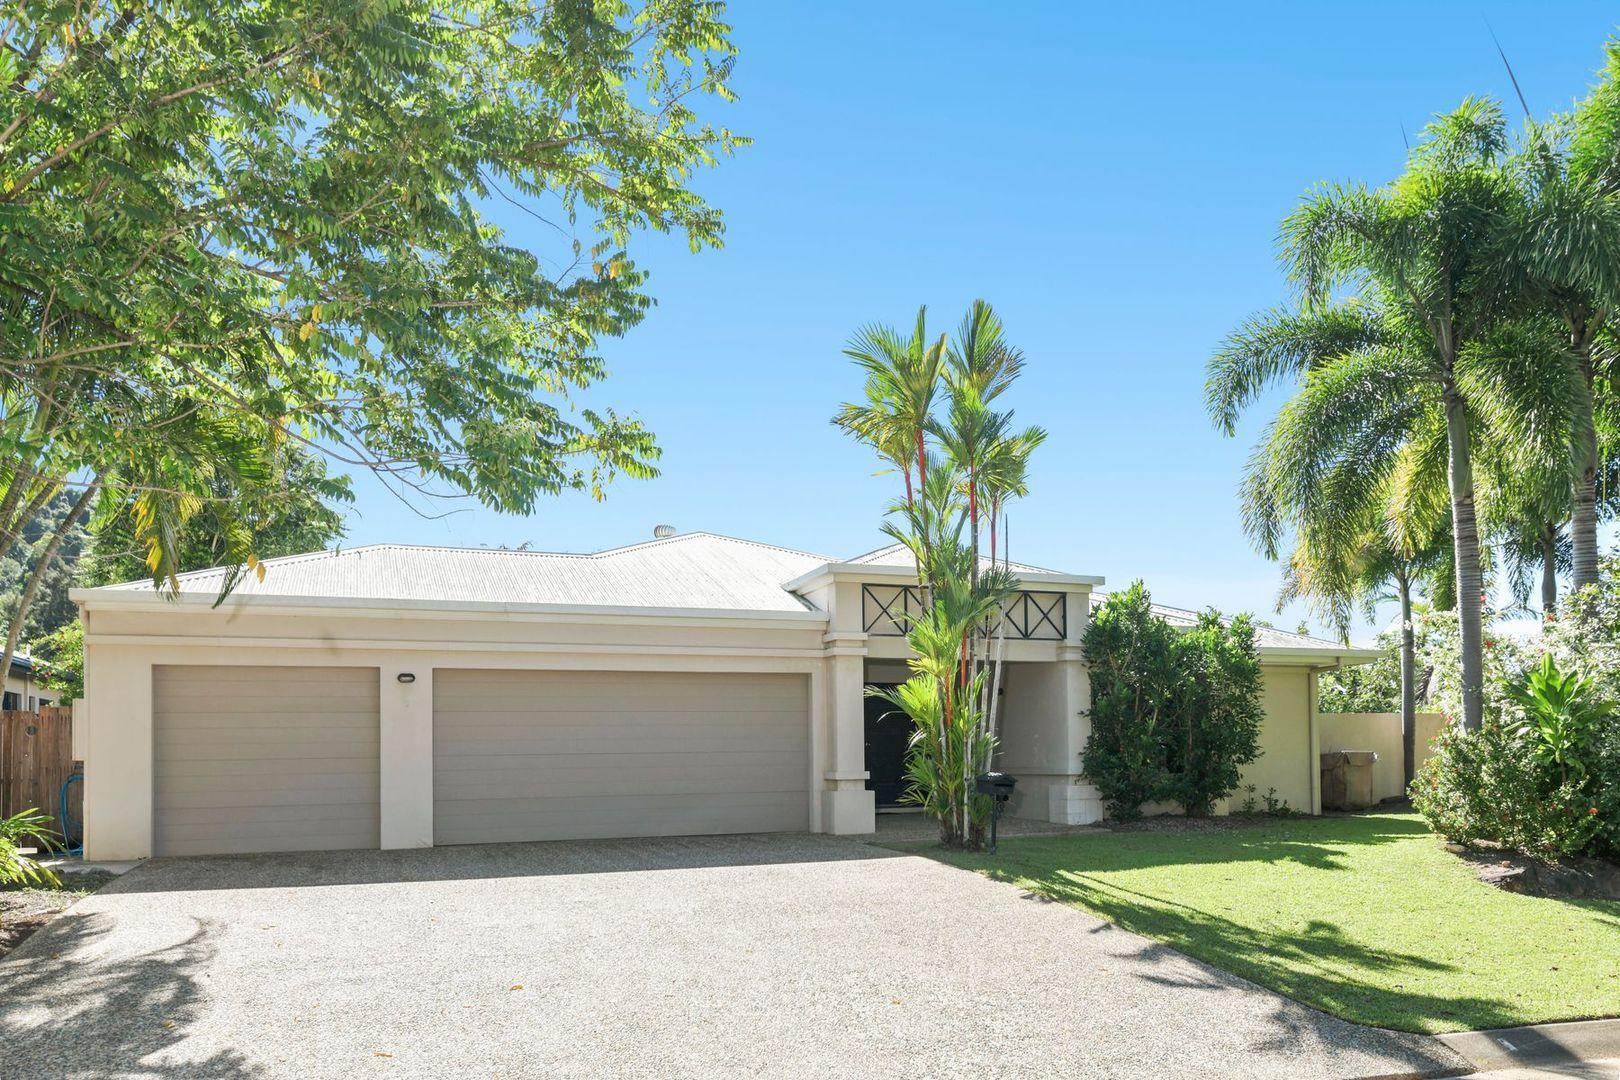 2 Kawana Street, Caravonica QLD 4878, Image 0